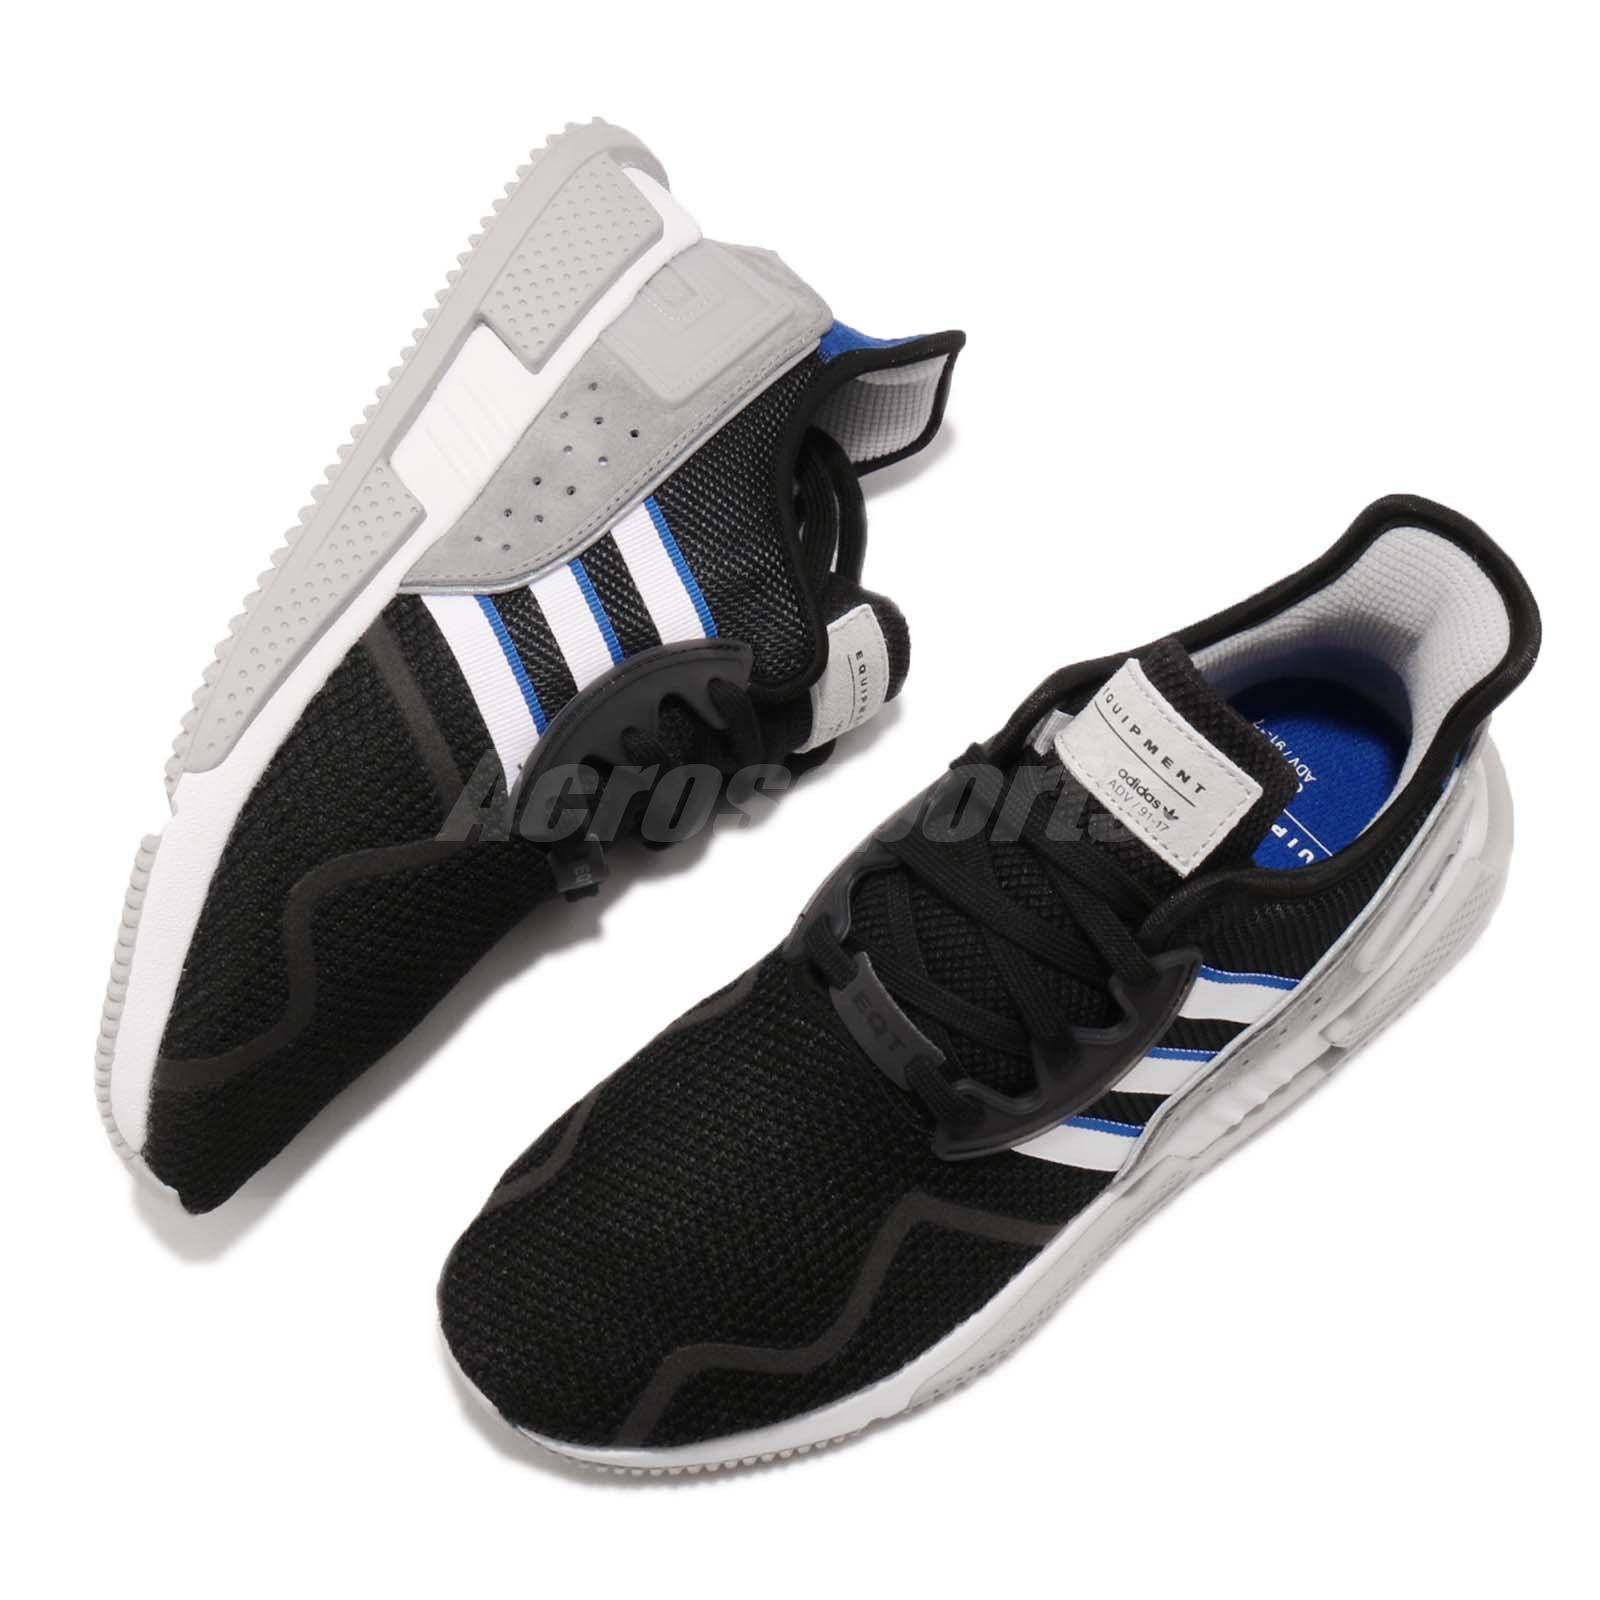 newest fdfe6 d8b72 adidas Originals EQT Cushion ADV Black Grey Blue Men Running